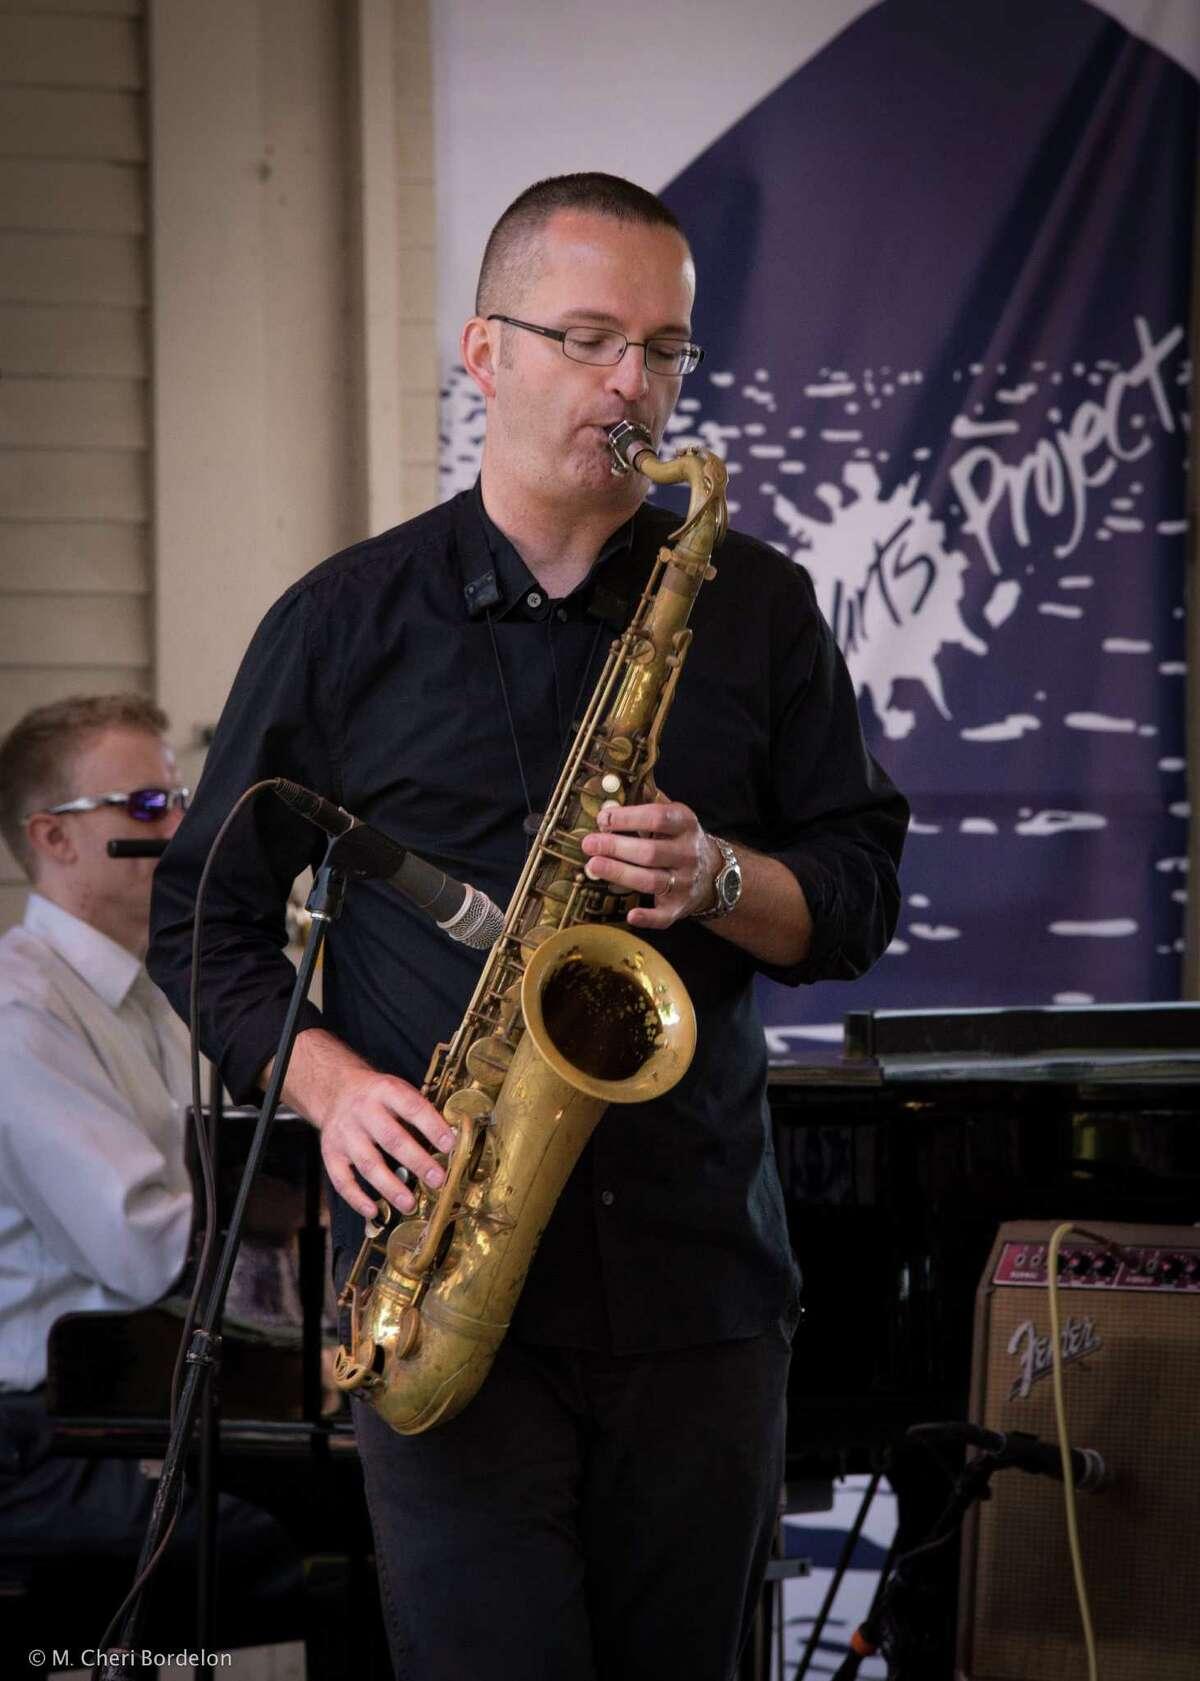 Brian Patneaude at Lake George Jazz Festival last fall. Photo archive/M Cheri Bordelon